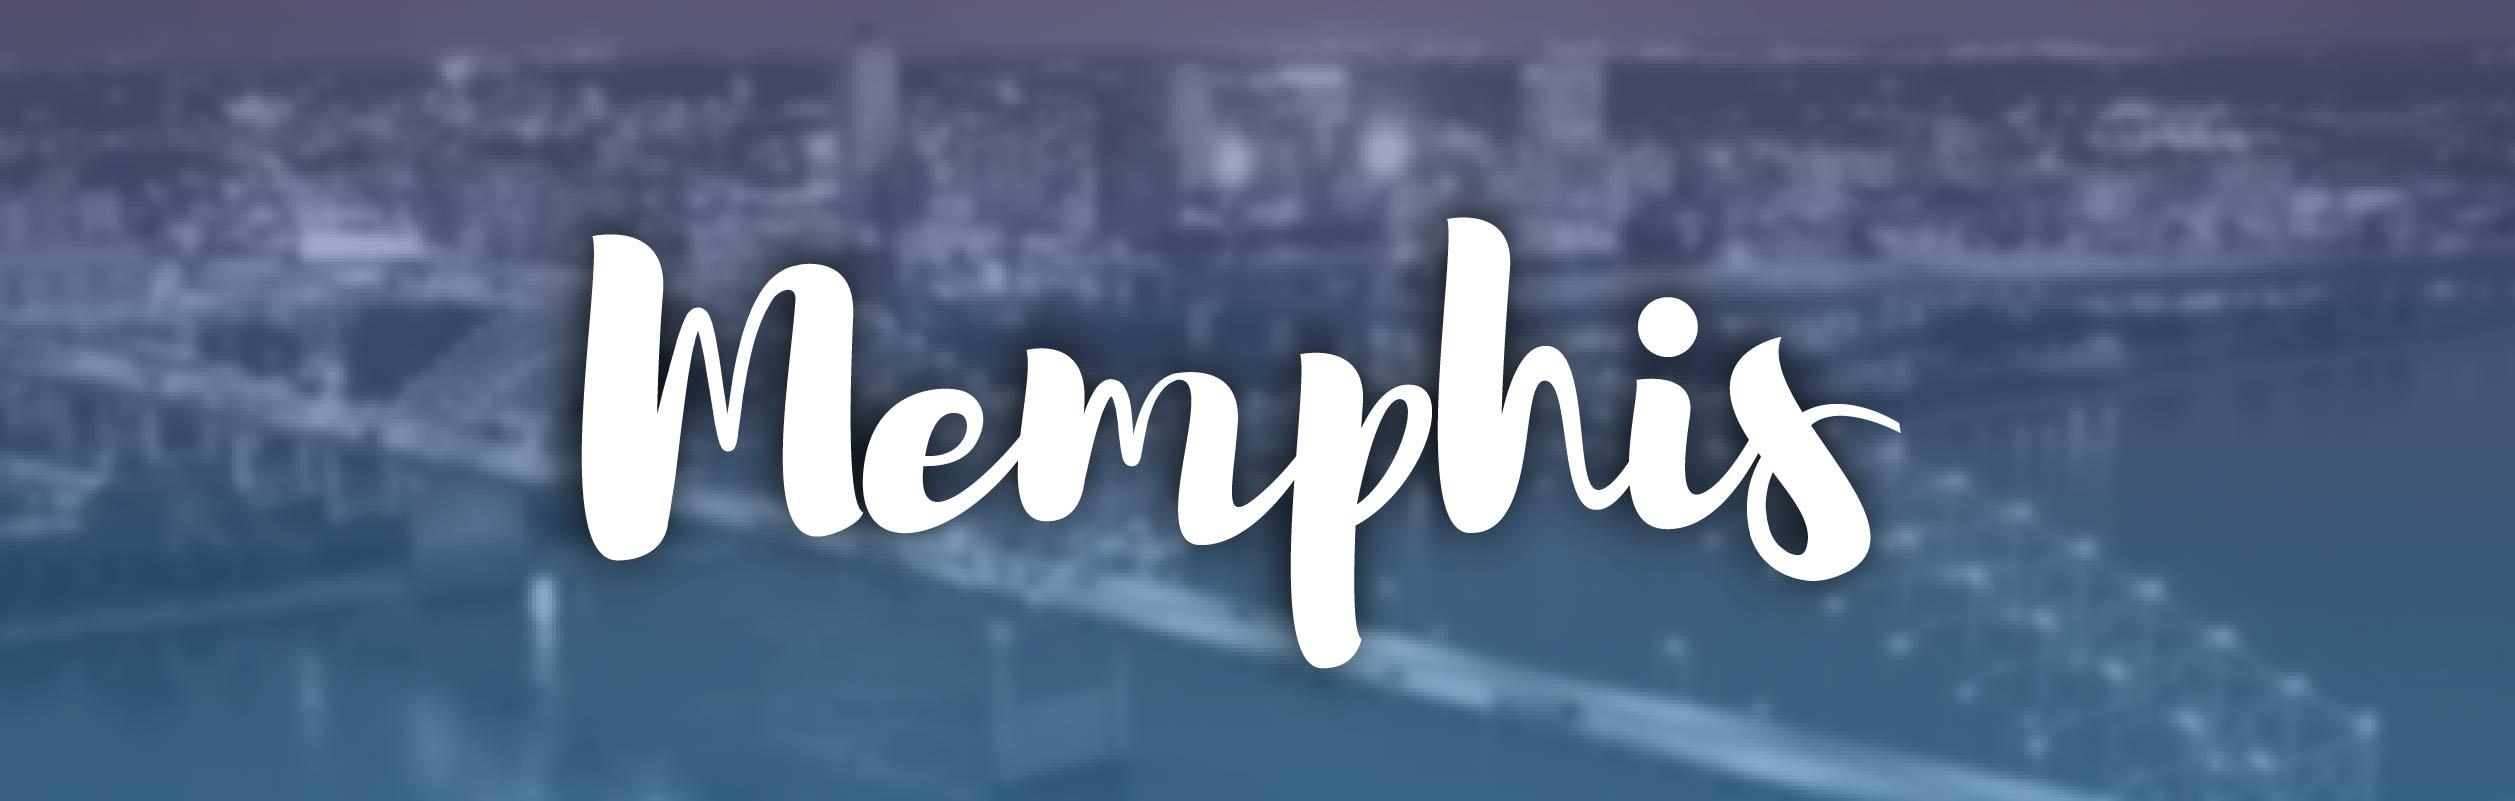 Memphis New-01